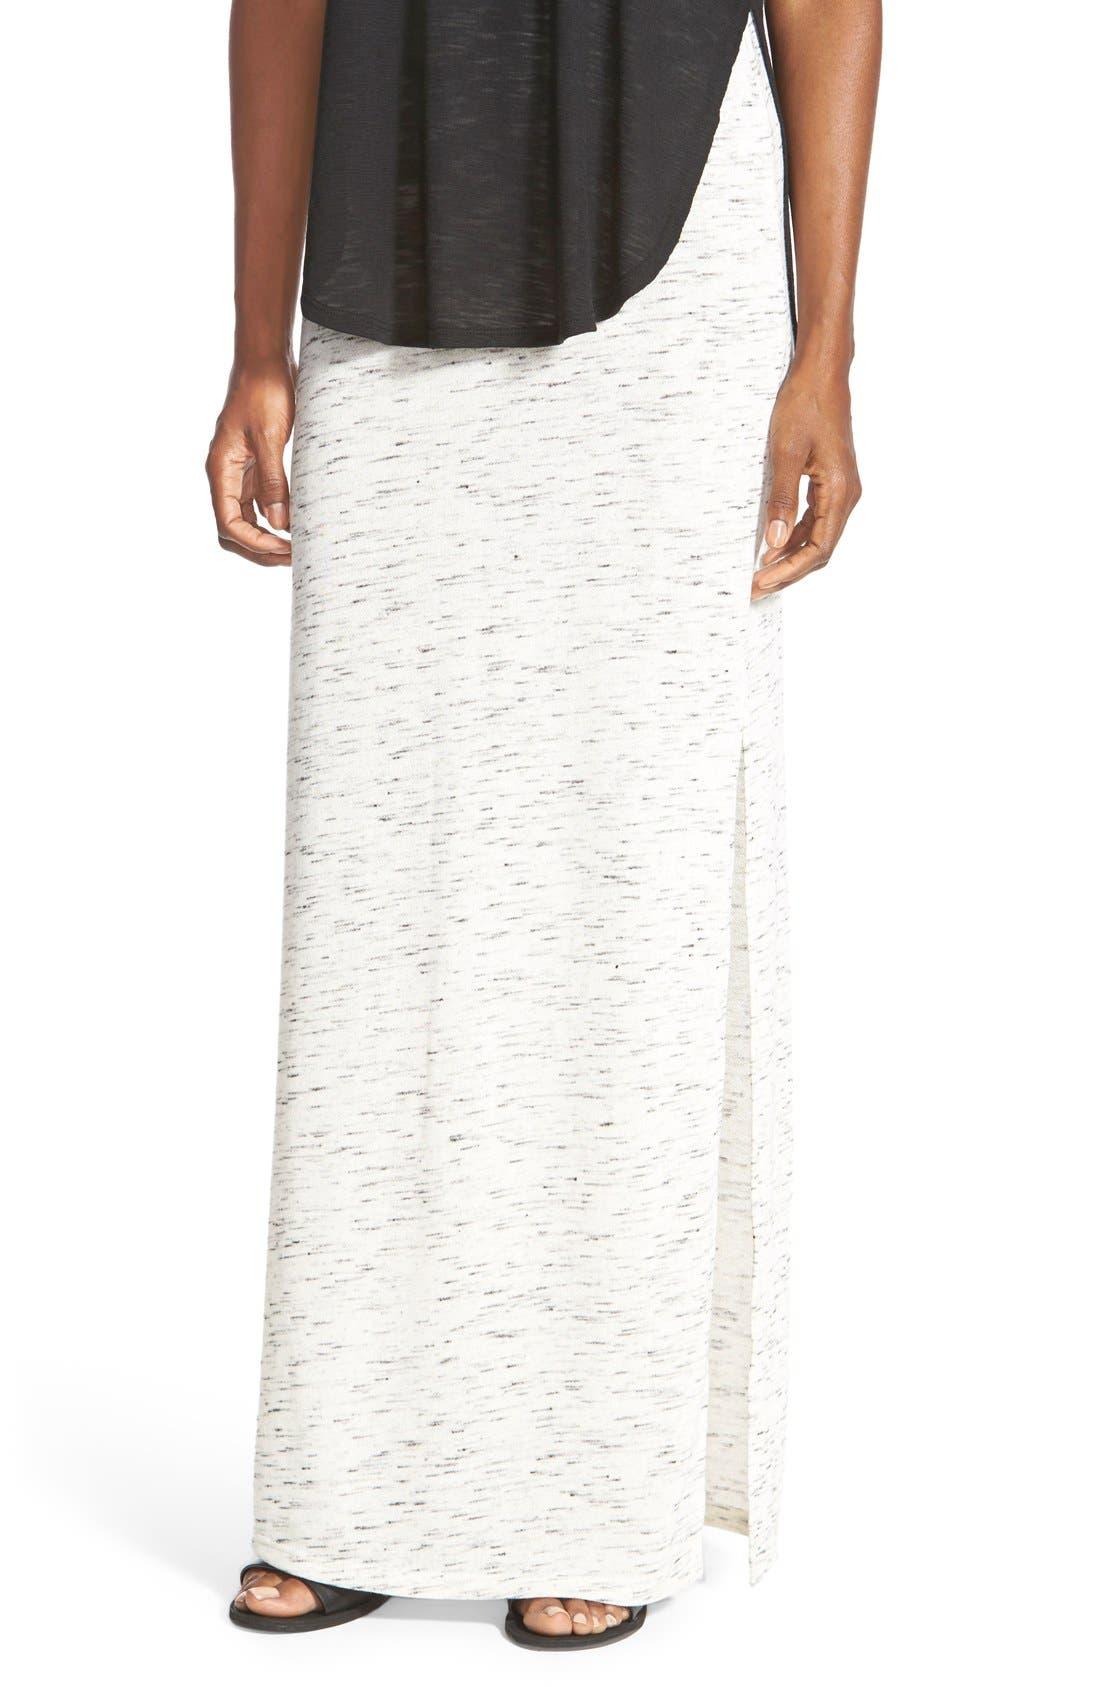 Alternate Image 1 Selected - The Hanger Heathered Knit Maxi Skirt (Juniors)